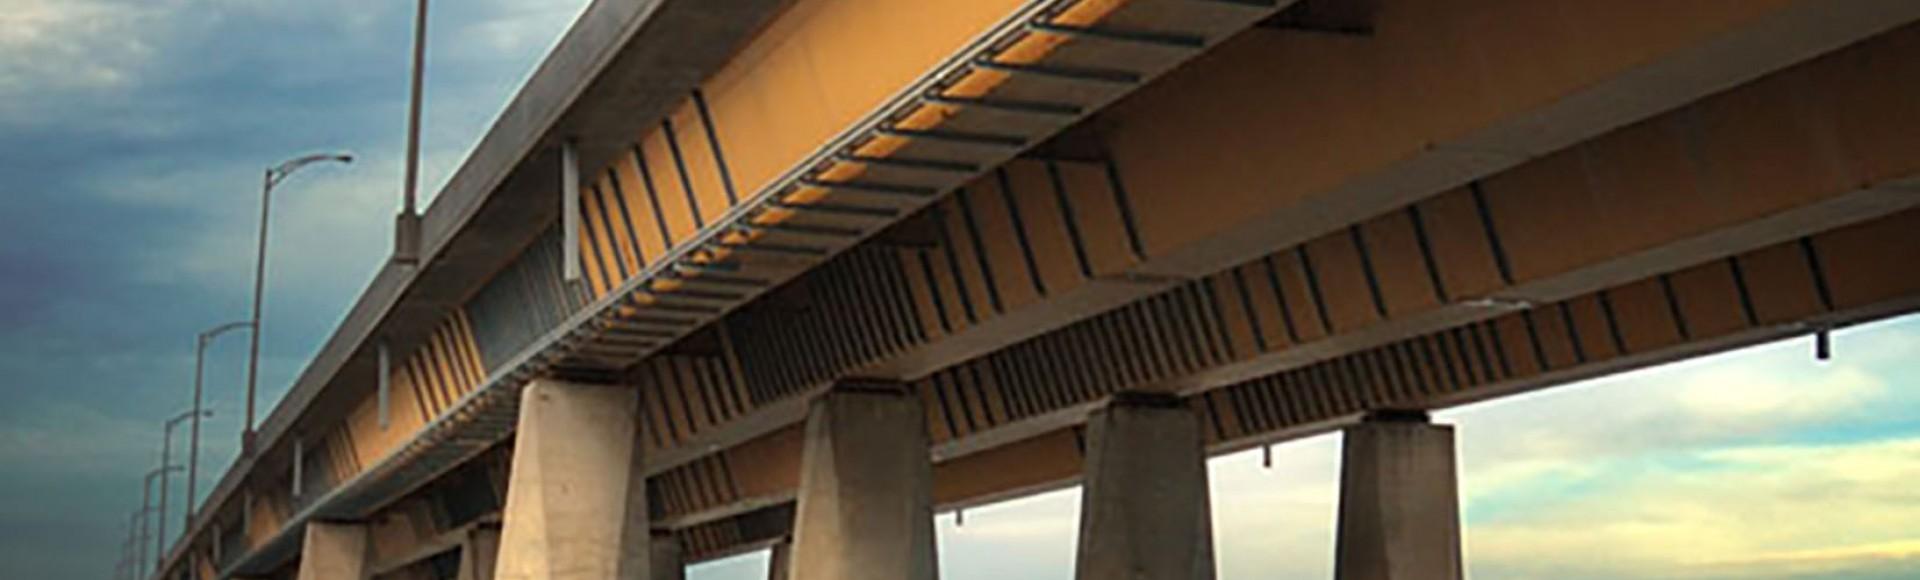 Pont Charles de Gaulle Montreal – 1